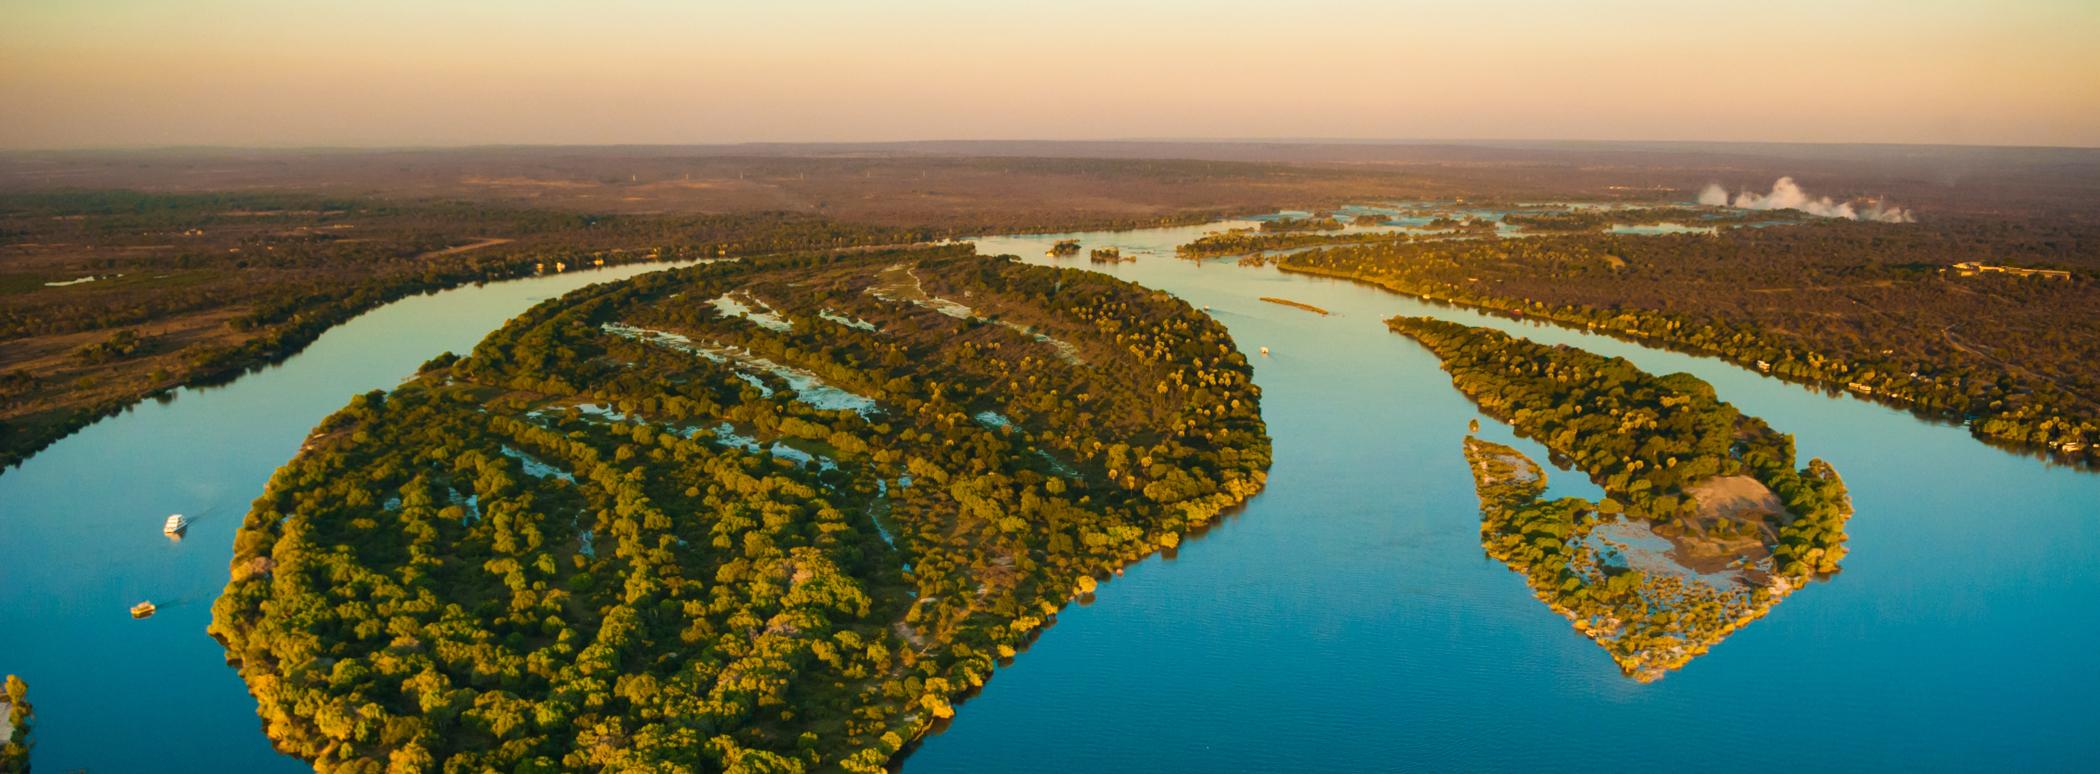 Zambezi river from the air